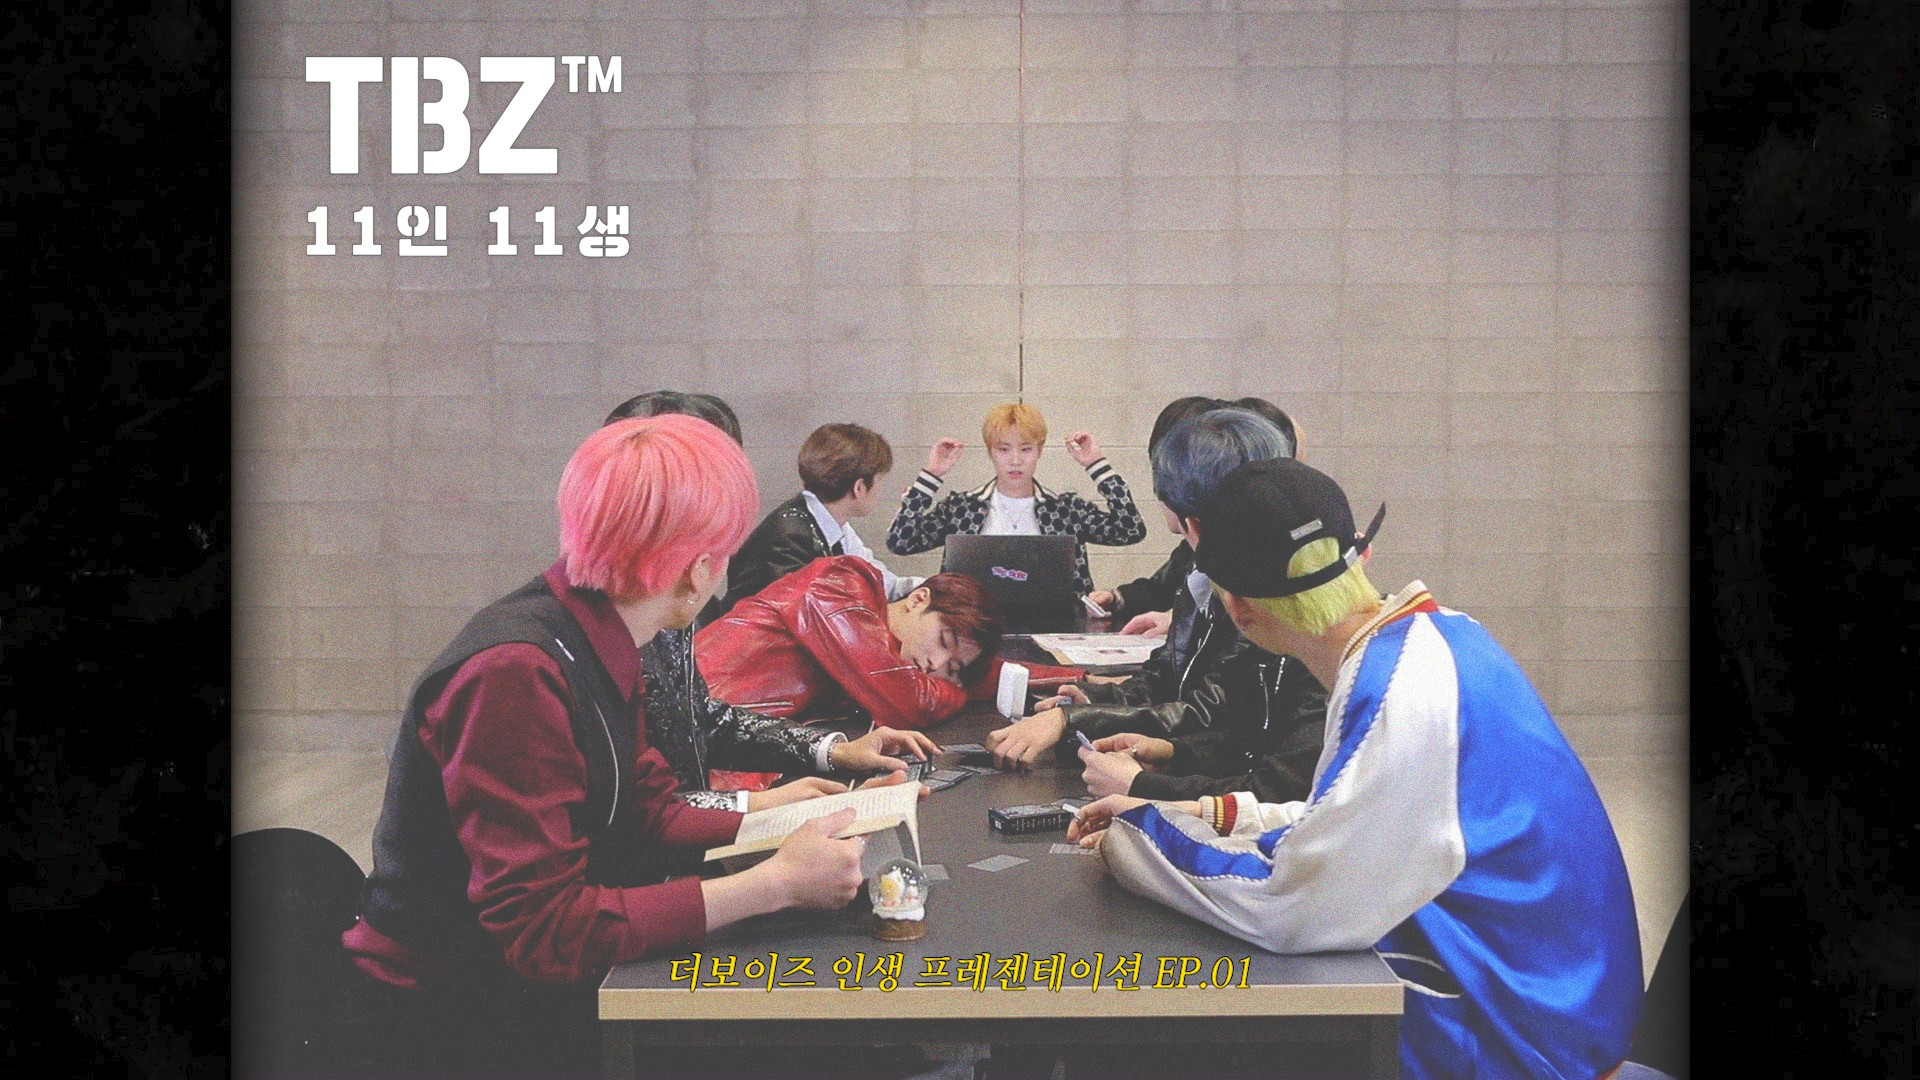 THE BOYZ(더보이즈) 11人11生 프레젠테이션 EP.01